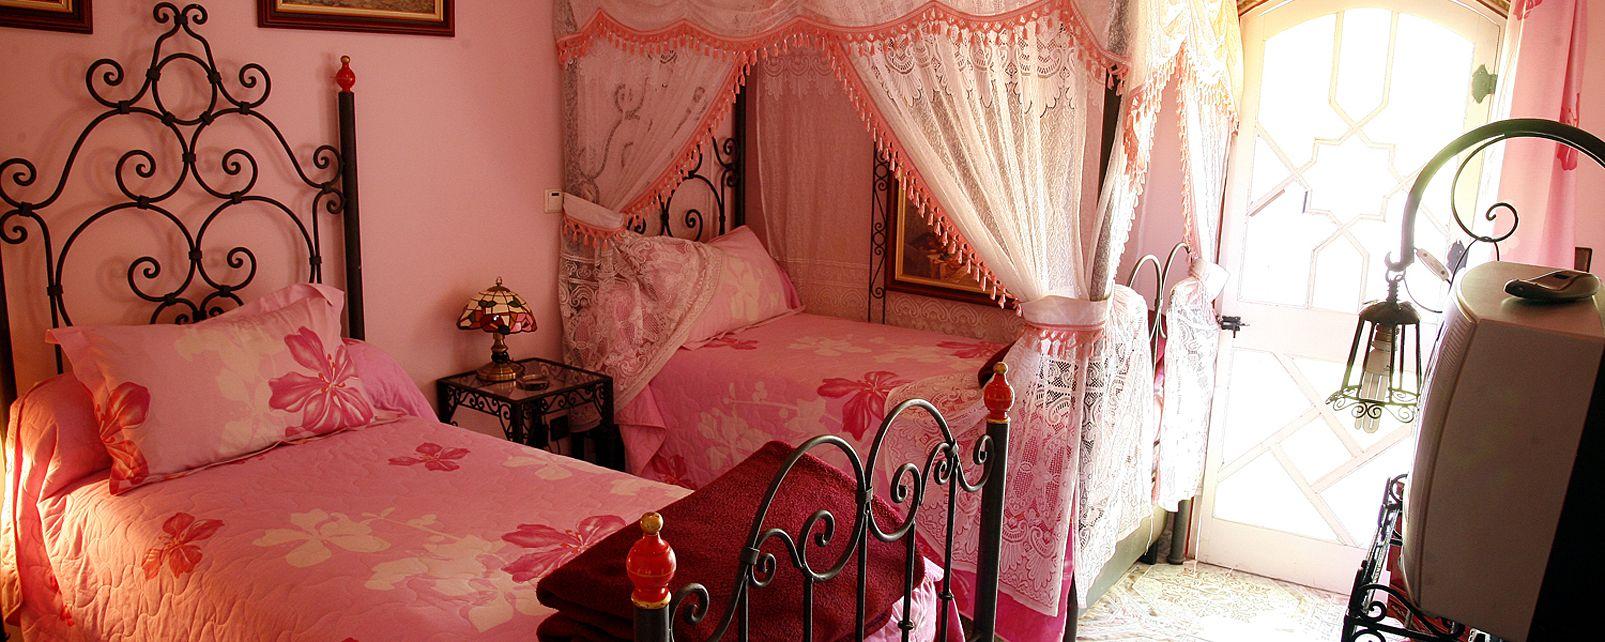 Hôtel Moroccan House Hotel